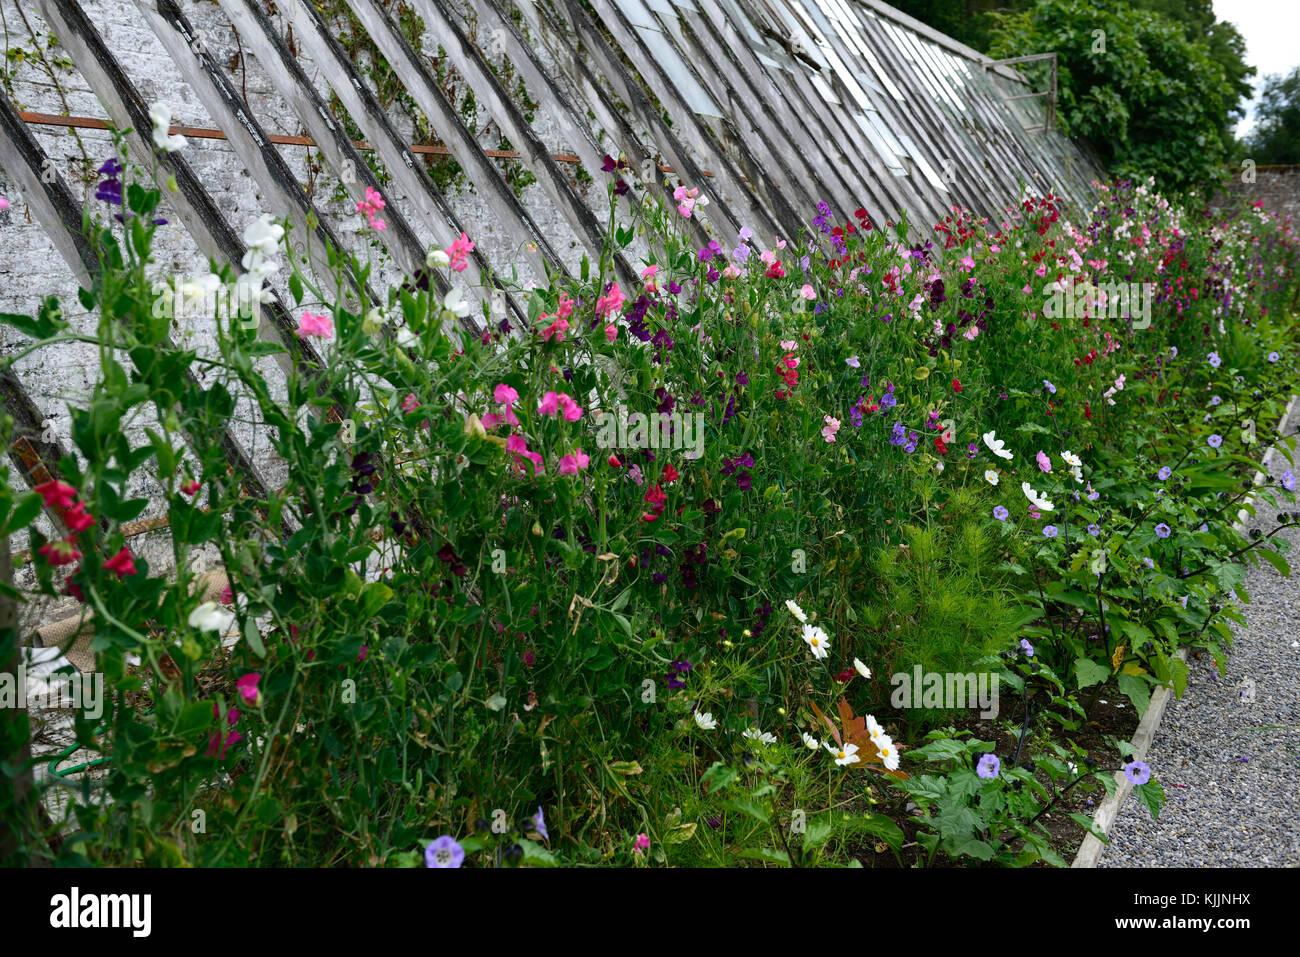 Lathyrus Sweet Peas Sweet Pea Trellis Fence Grow Growing Up